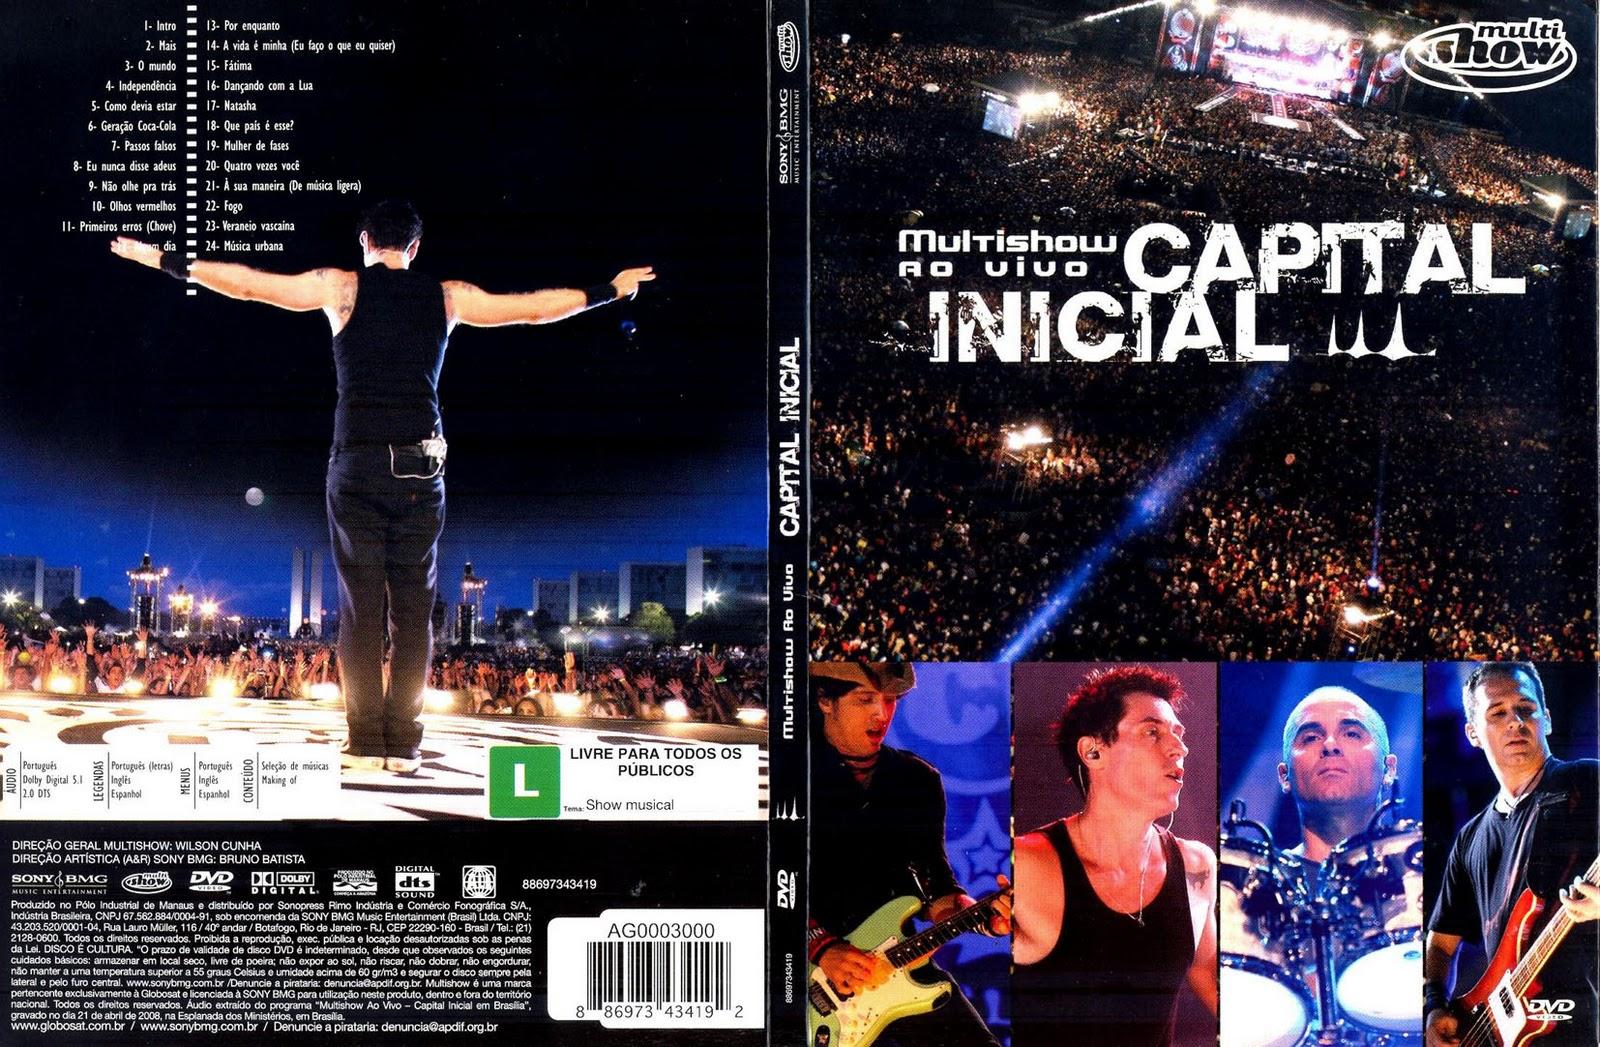 INICIAL MULTISHOW GRATIS AO CAPITAL BAIXAR VIVO DVD